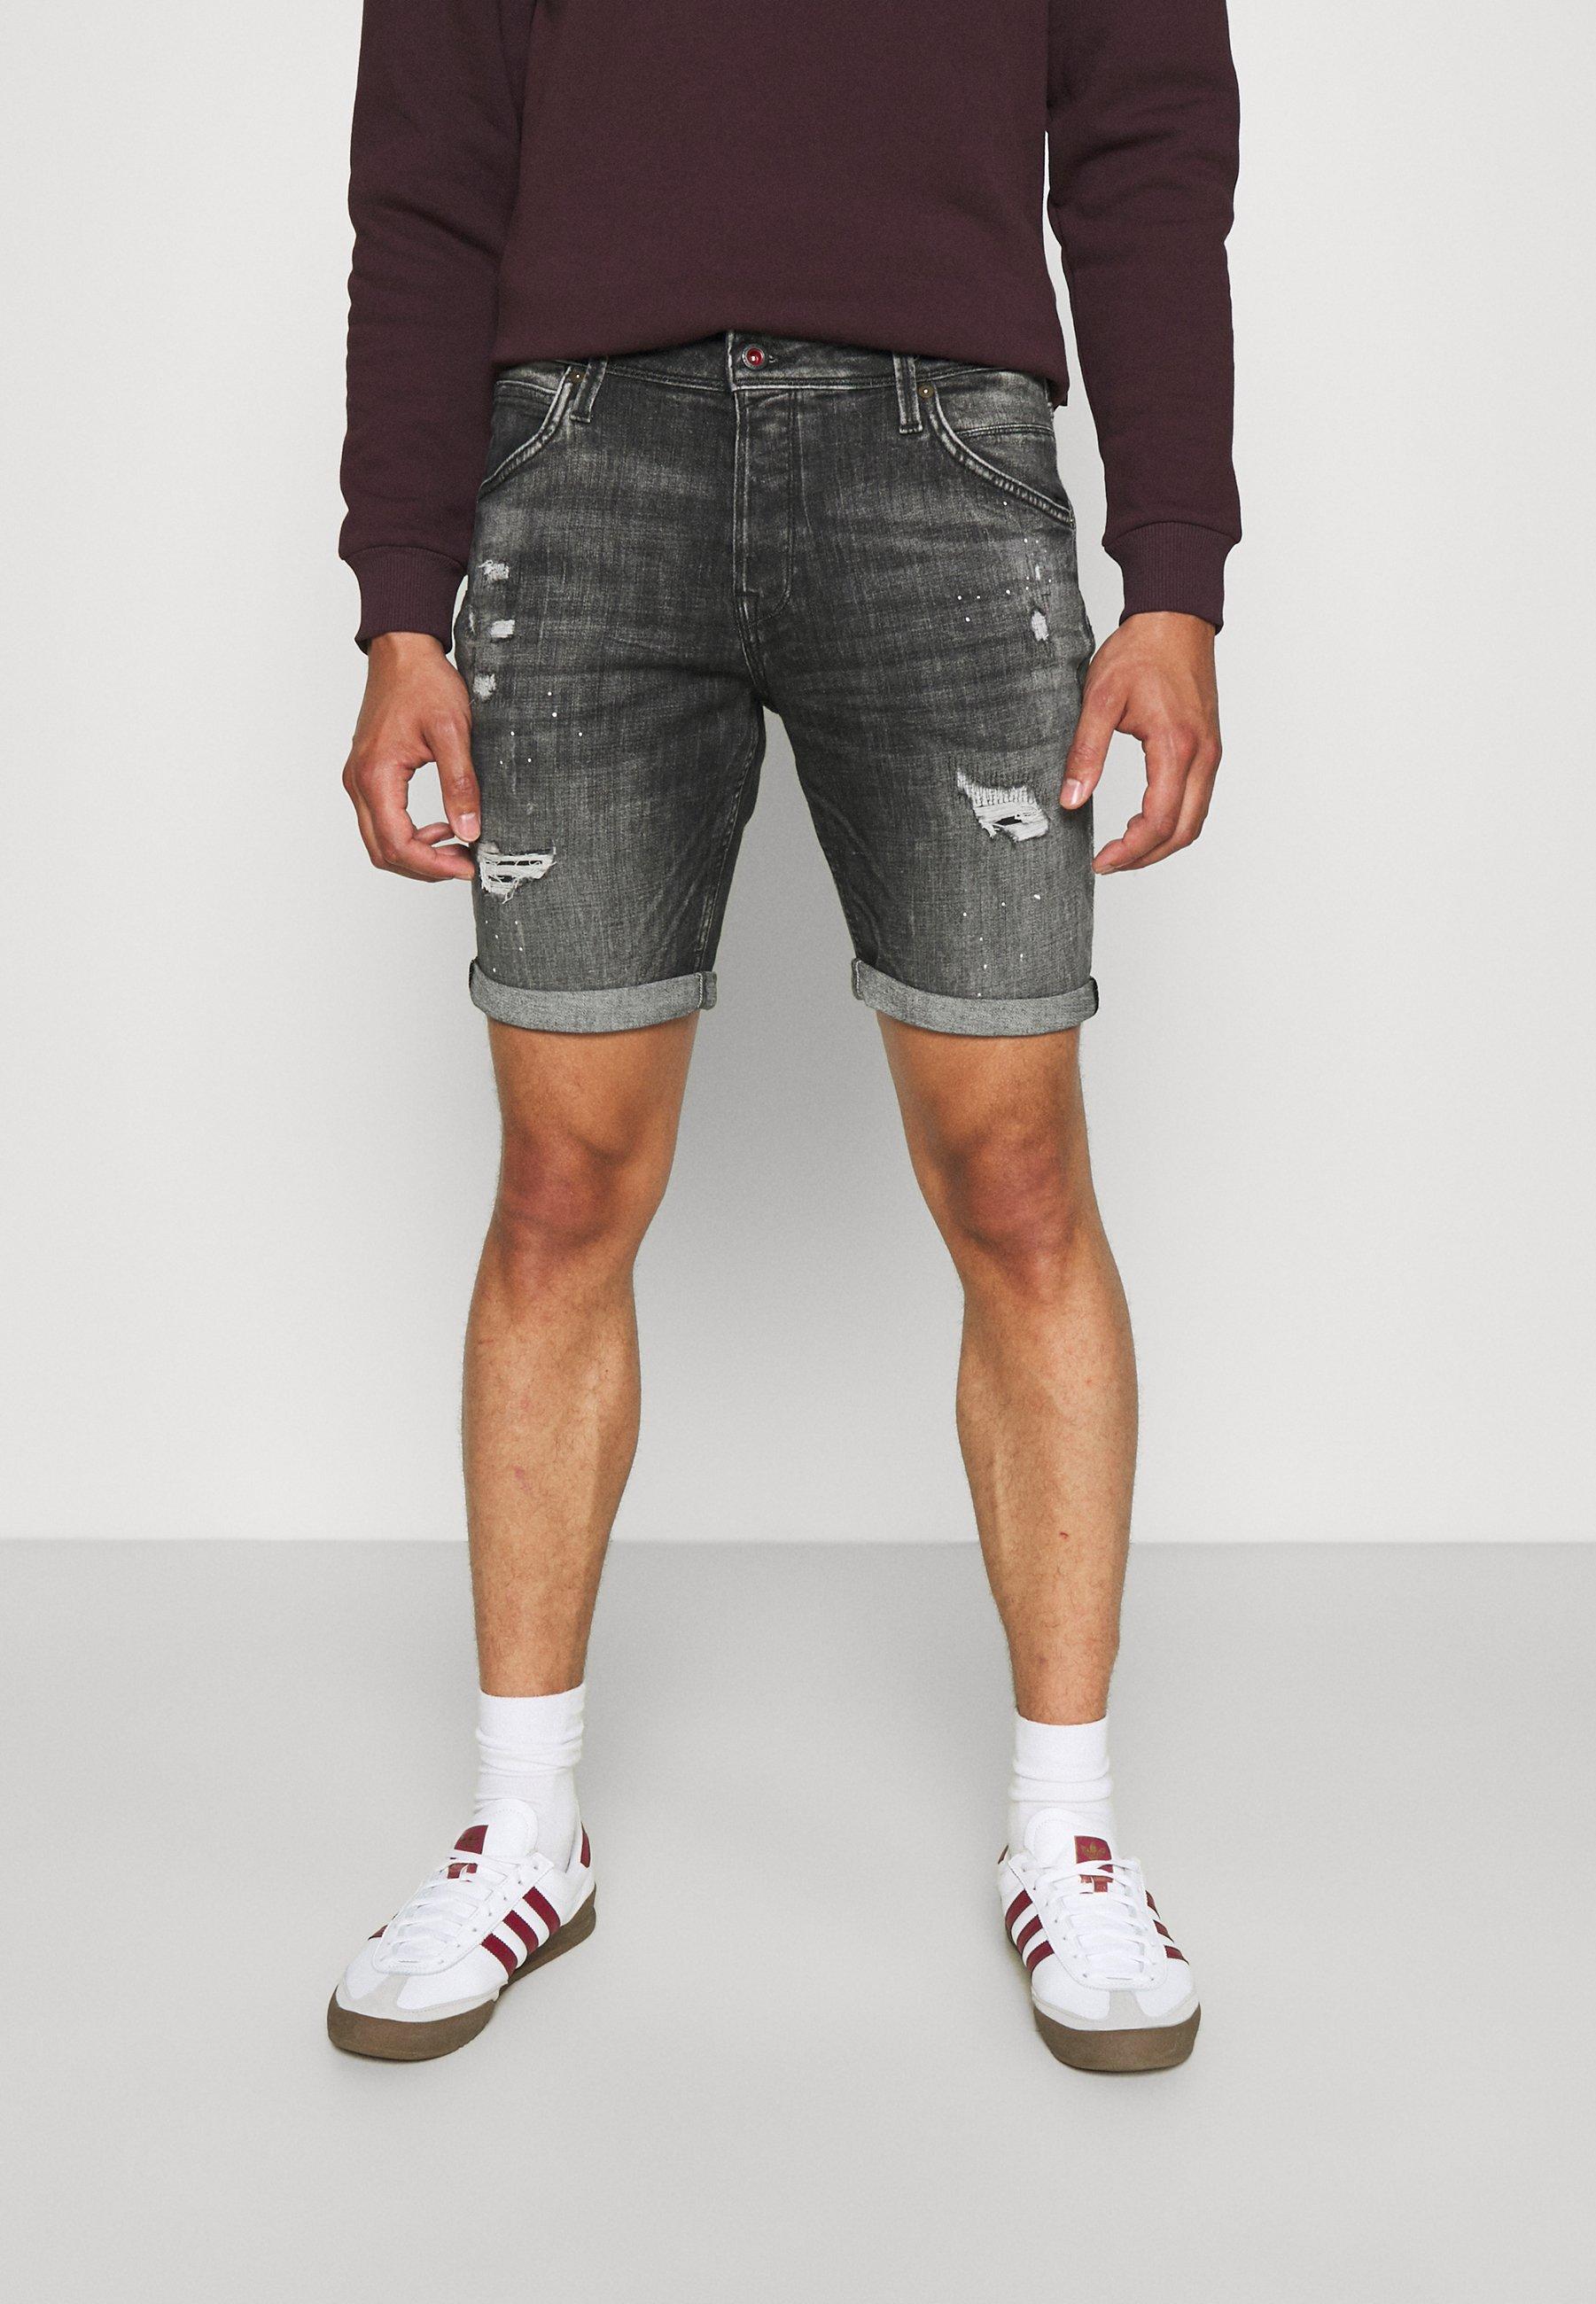 Homme JJIRICK JJFOXSHORTS - Short en jean